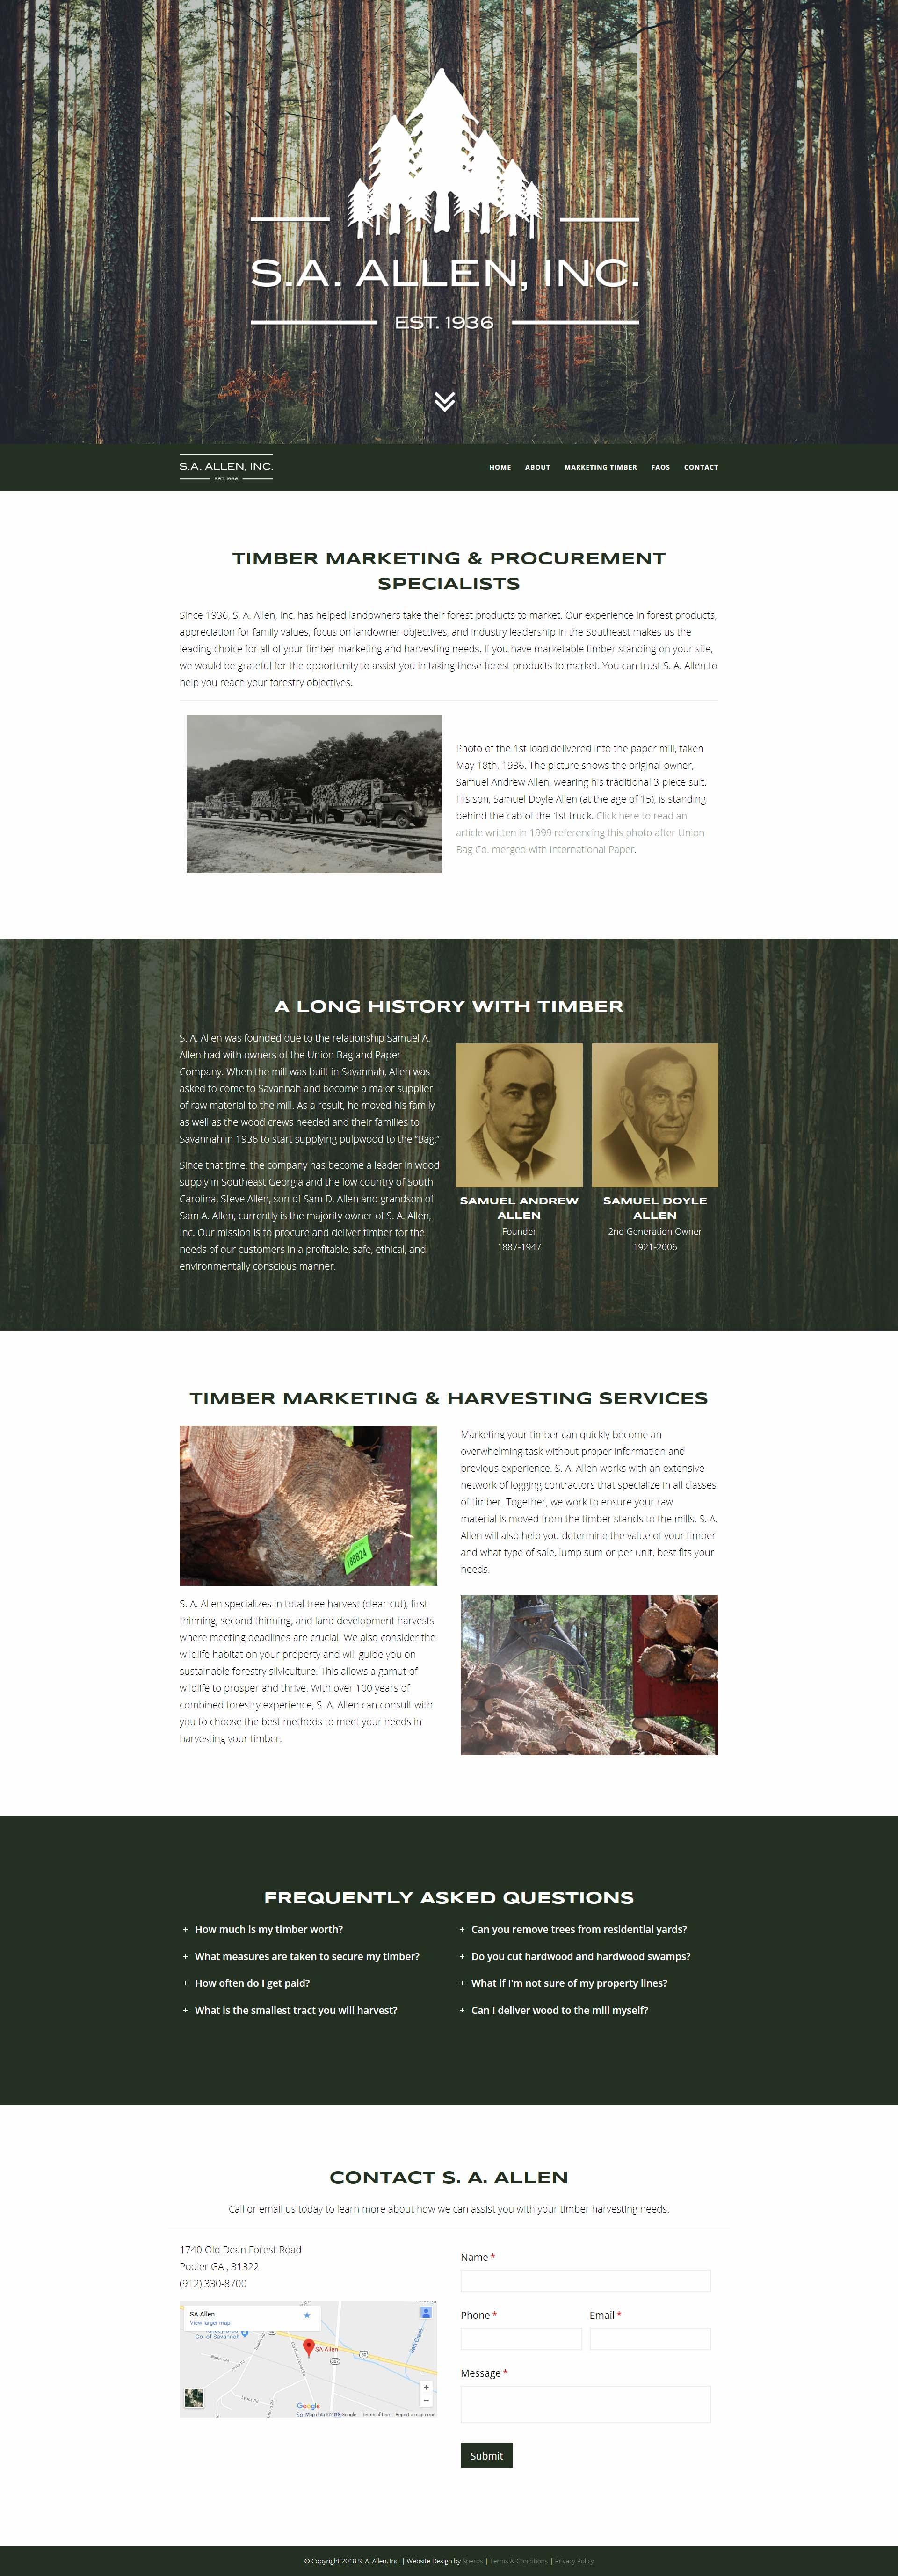 S. A. Allen, Inc. Website Homepage - Speros Web Design - Savannah, GA